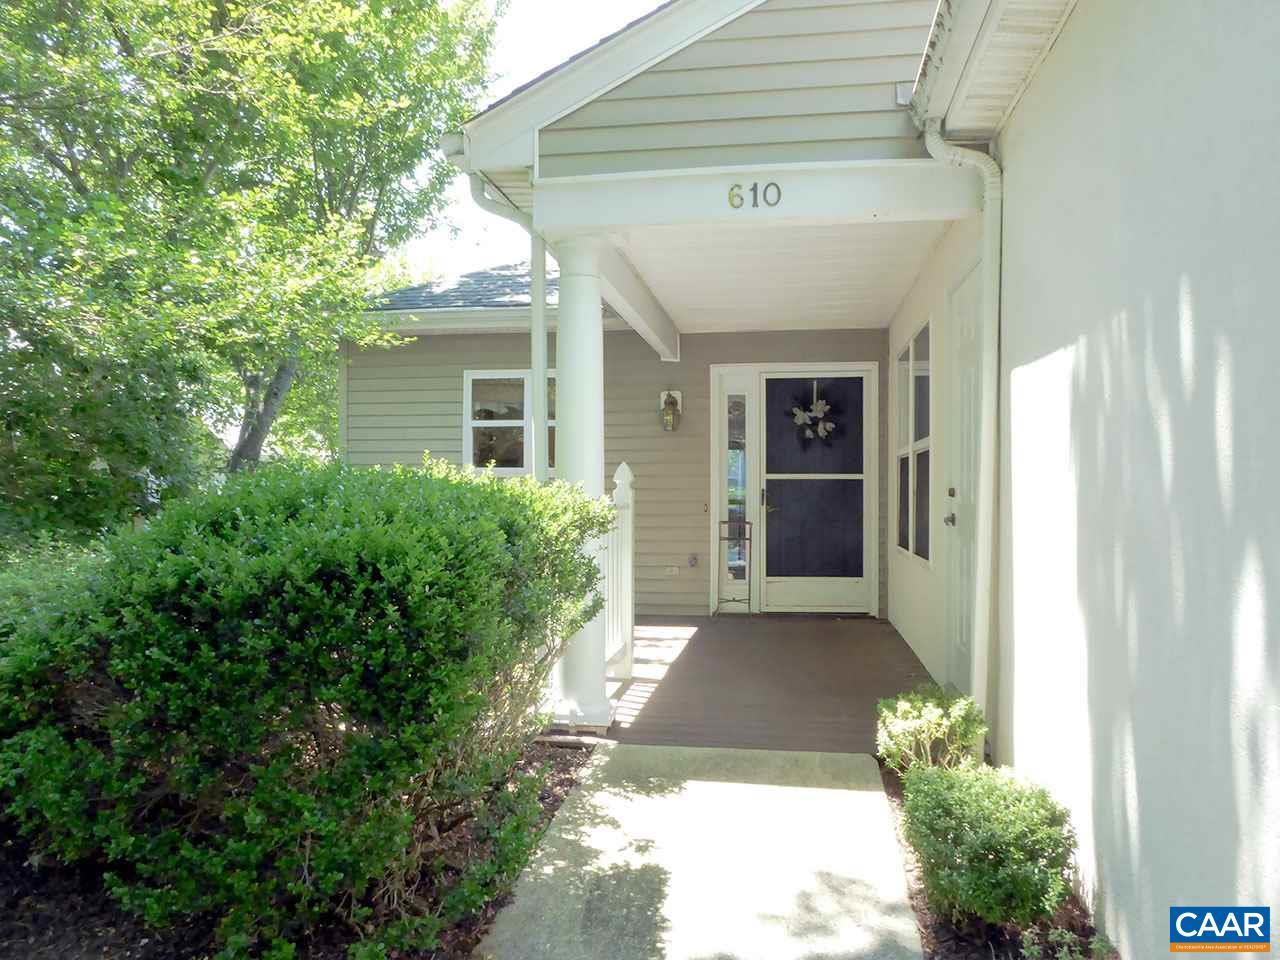 home for sale , MLS #578022, 610 Mockingbird Way